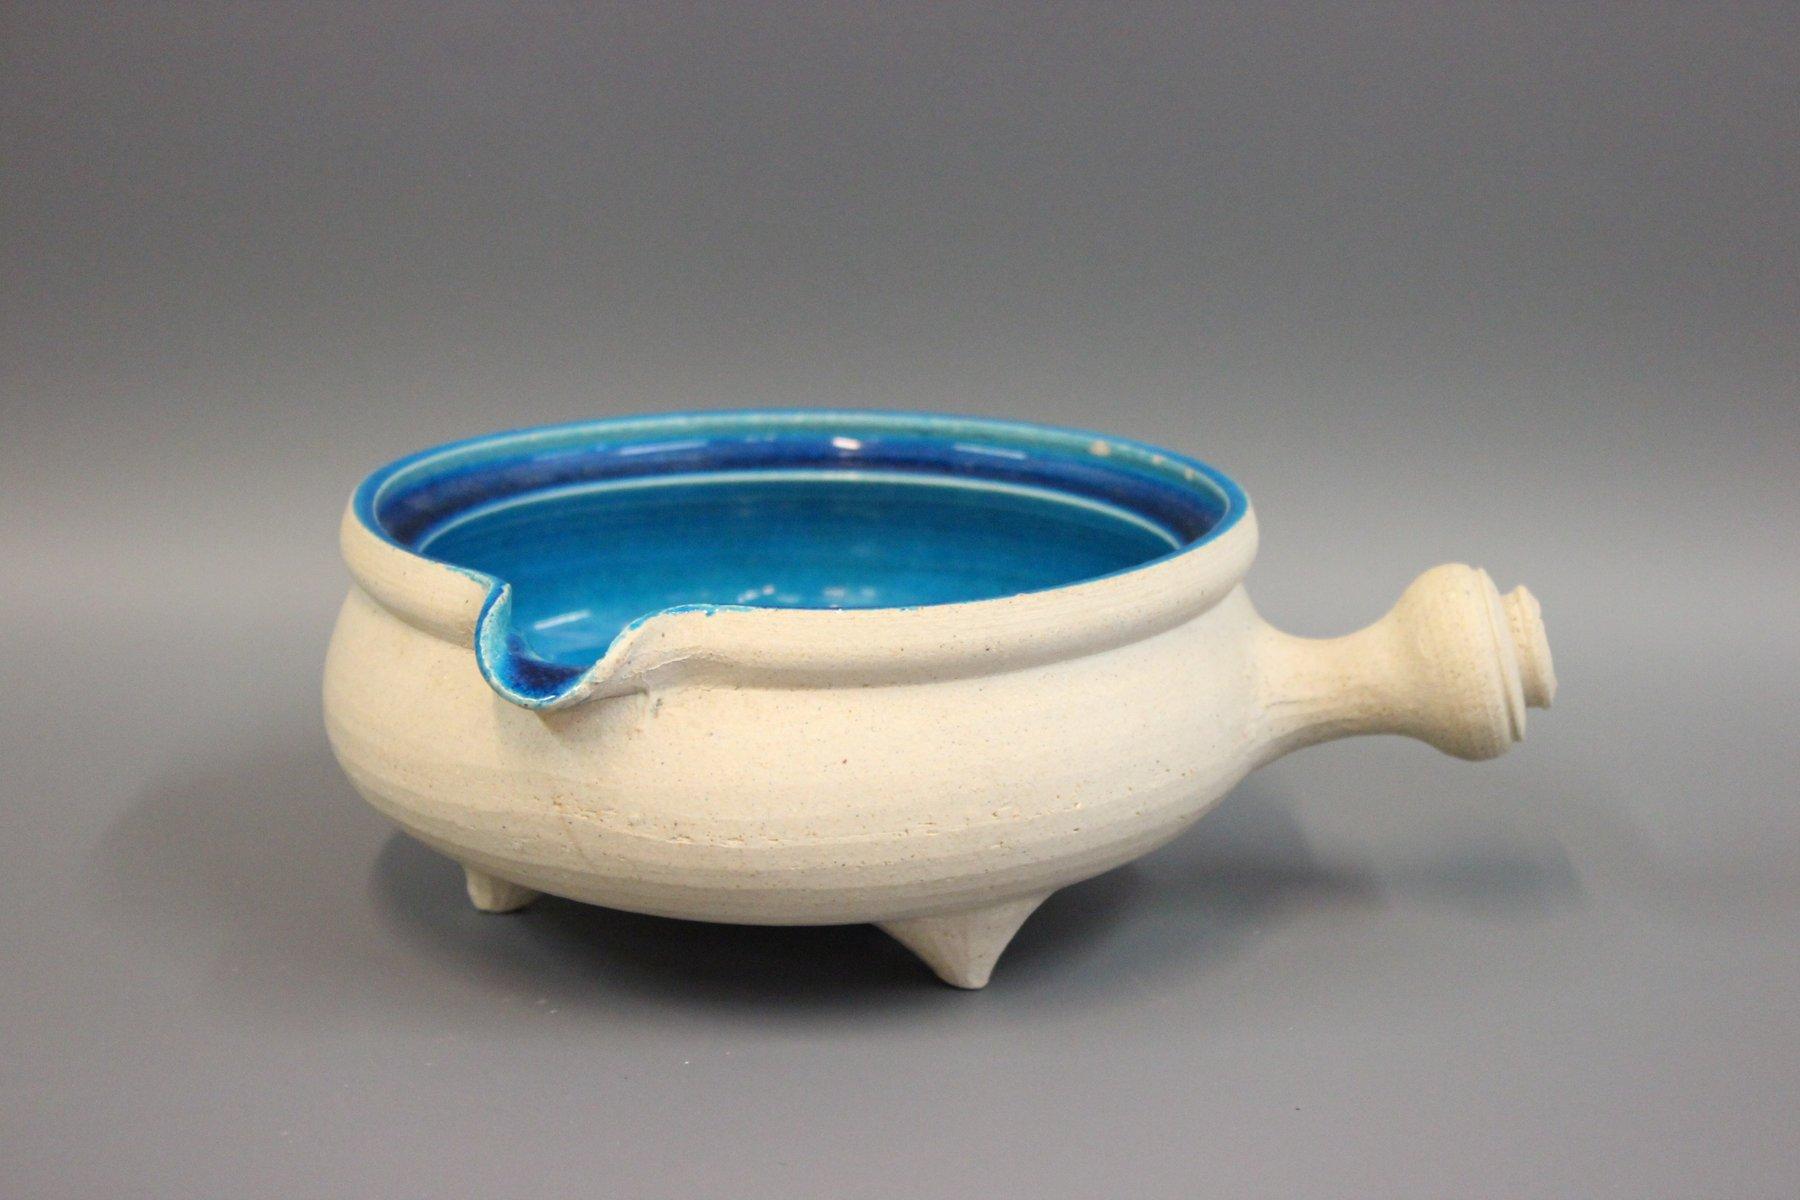 Aus Was Besteht Keramik aus was besteht keramik porzellan oder keramik foto die